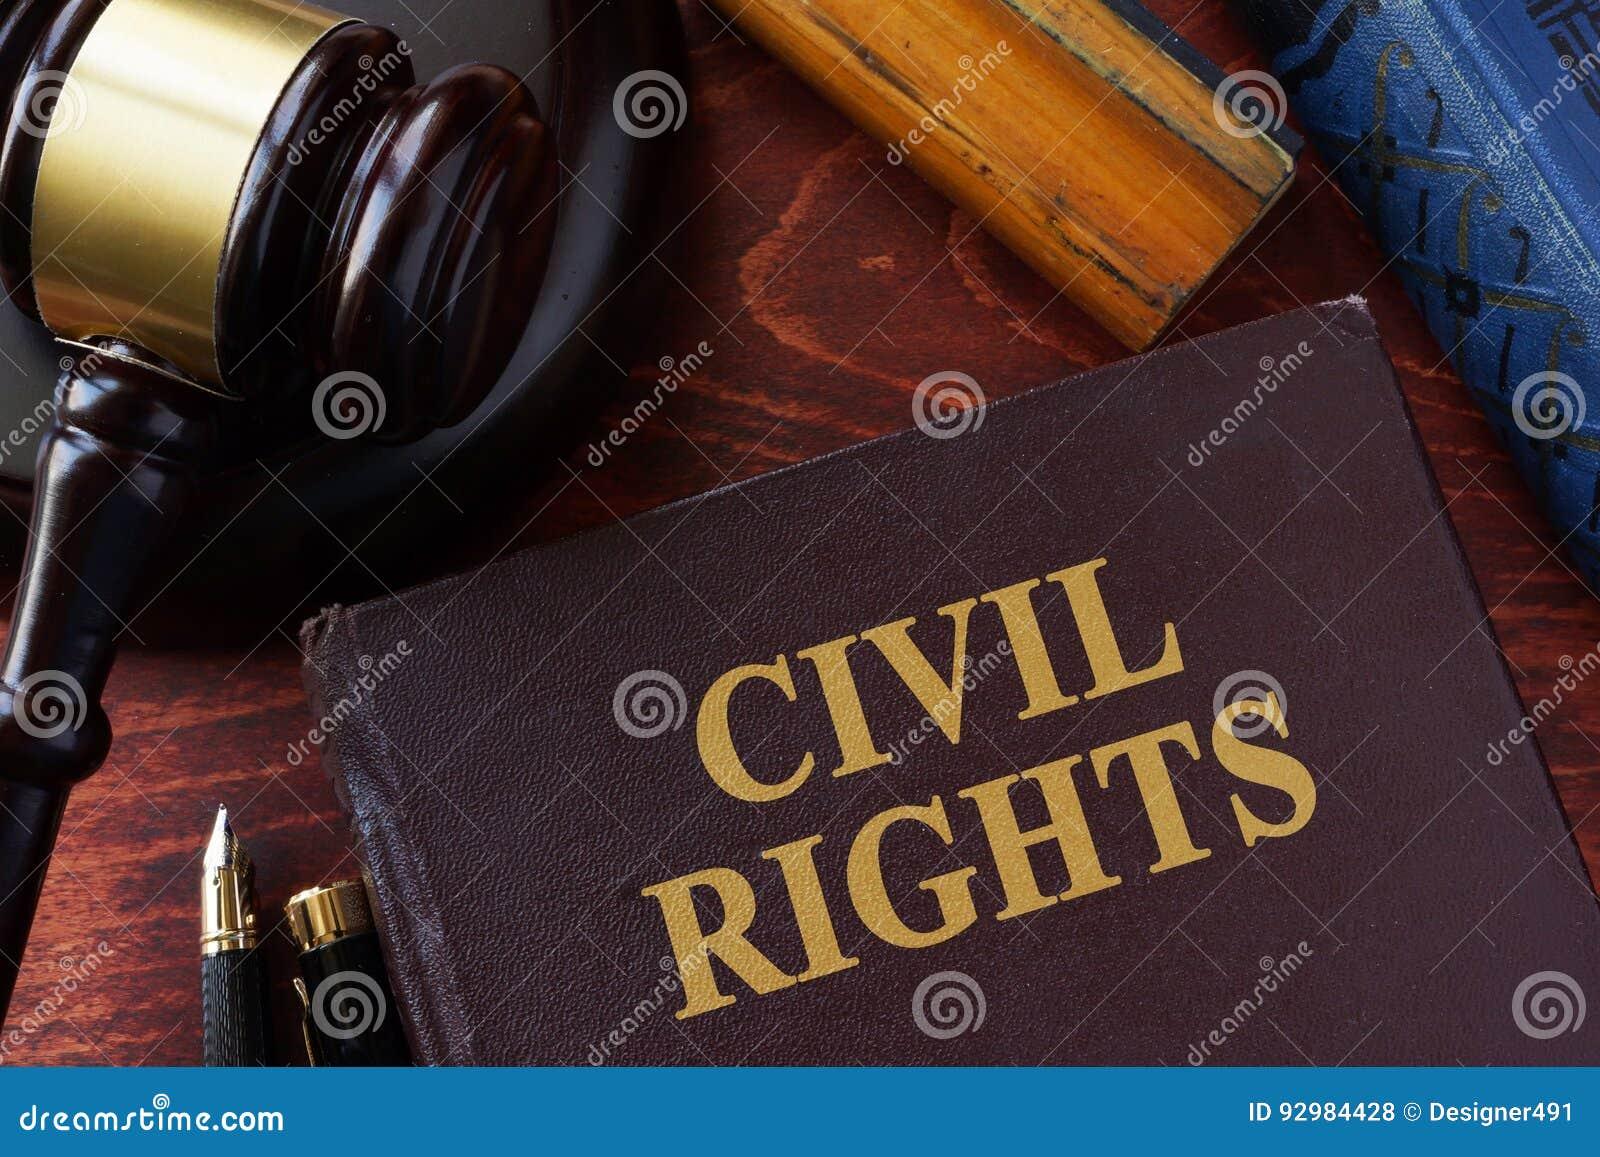 Civil Rights.